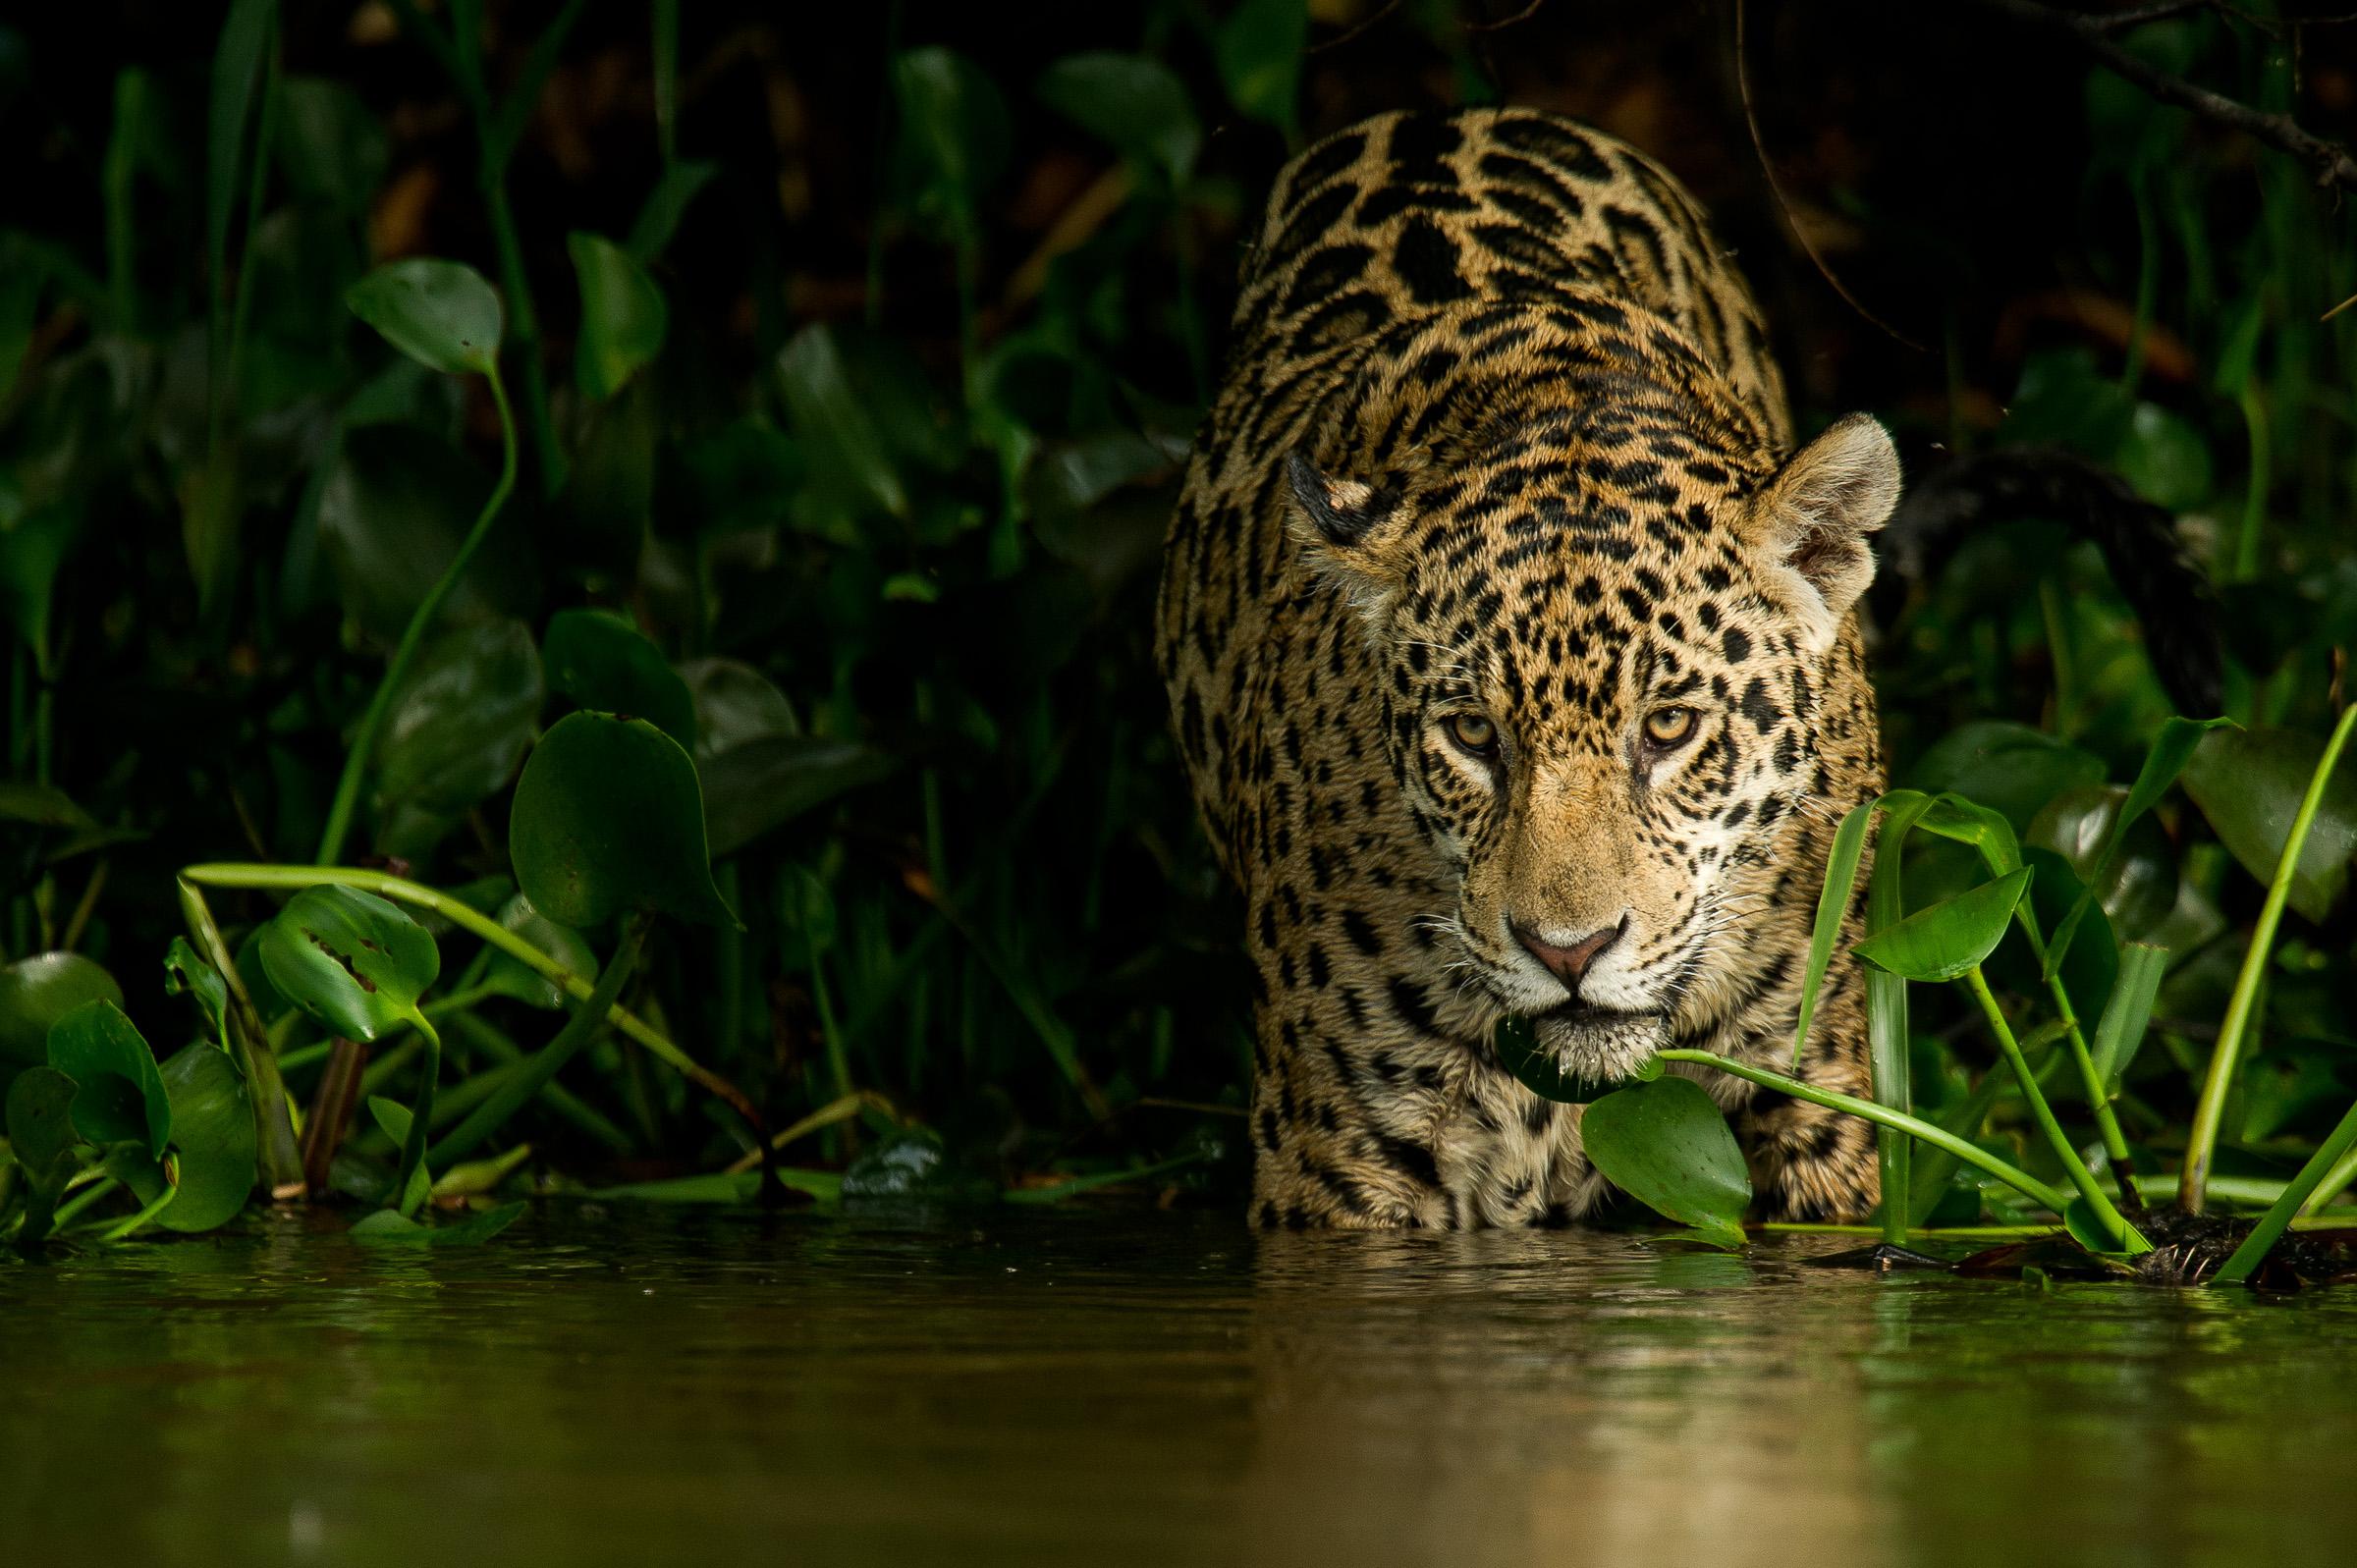 2013-10-17 Pantanal_Brasilien-6599-Edit